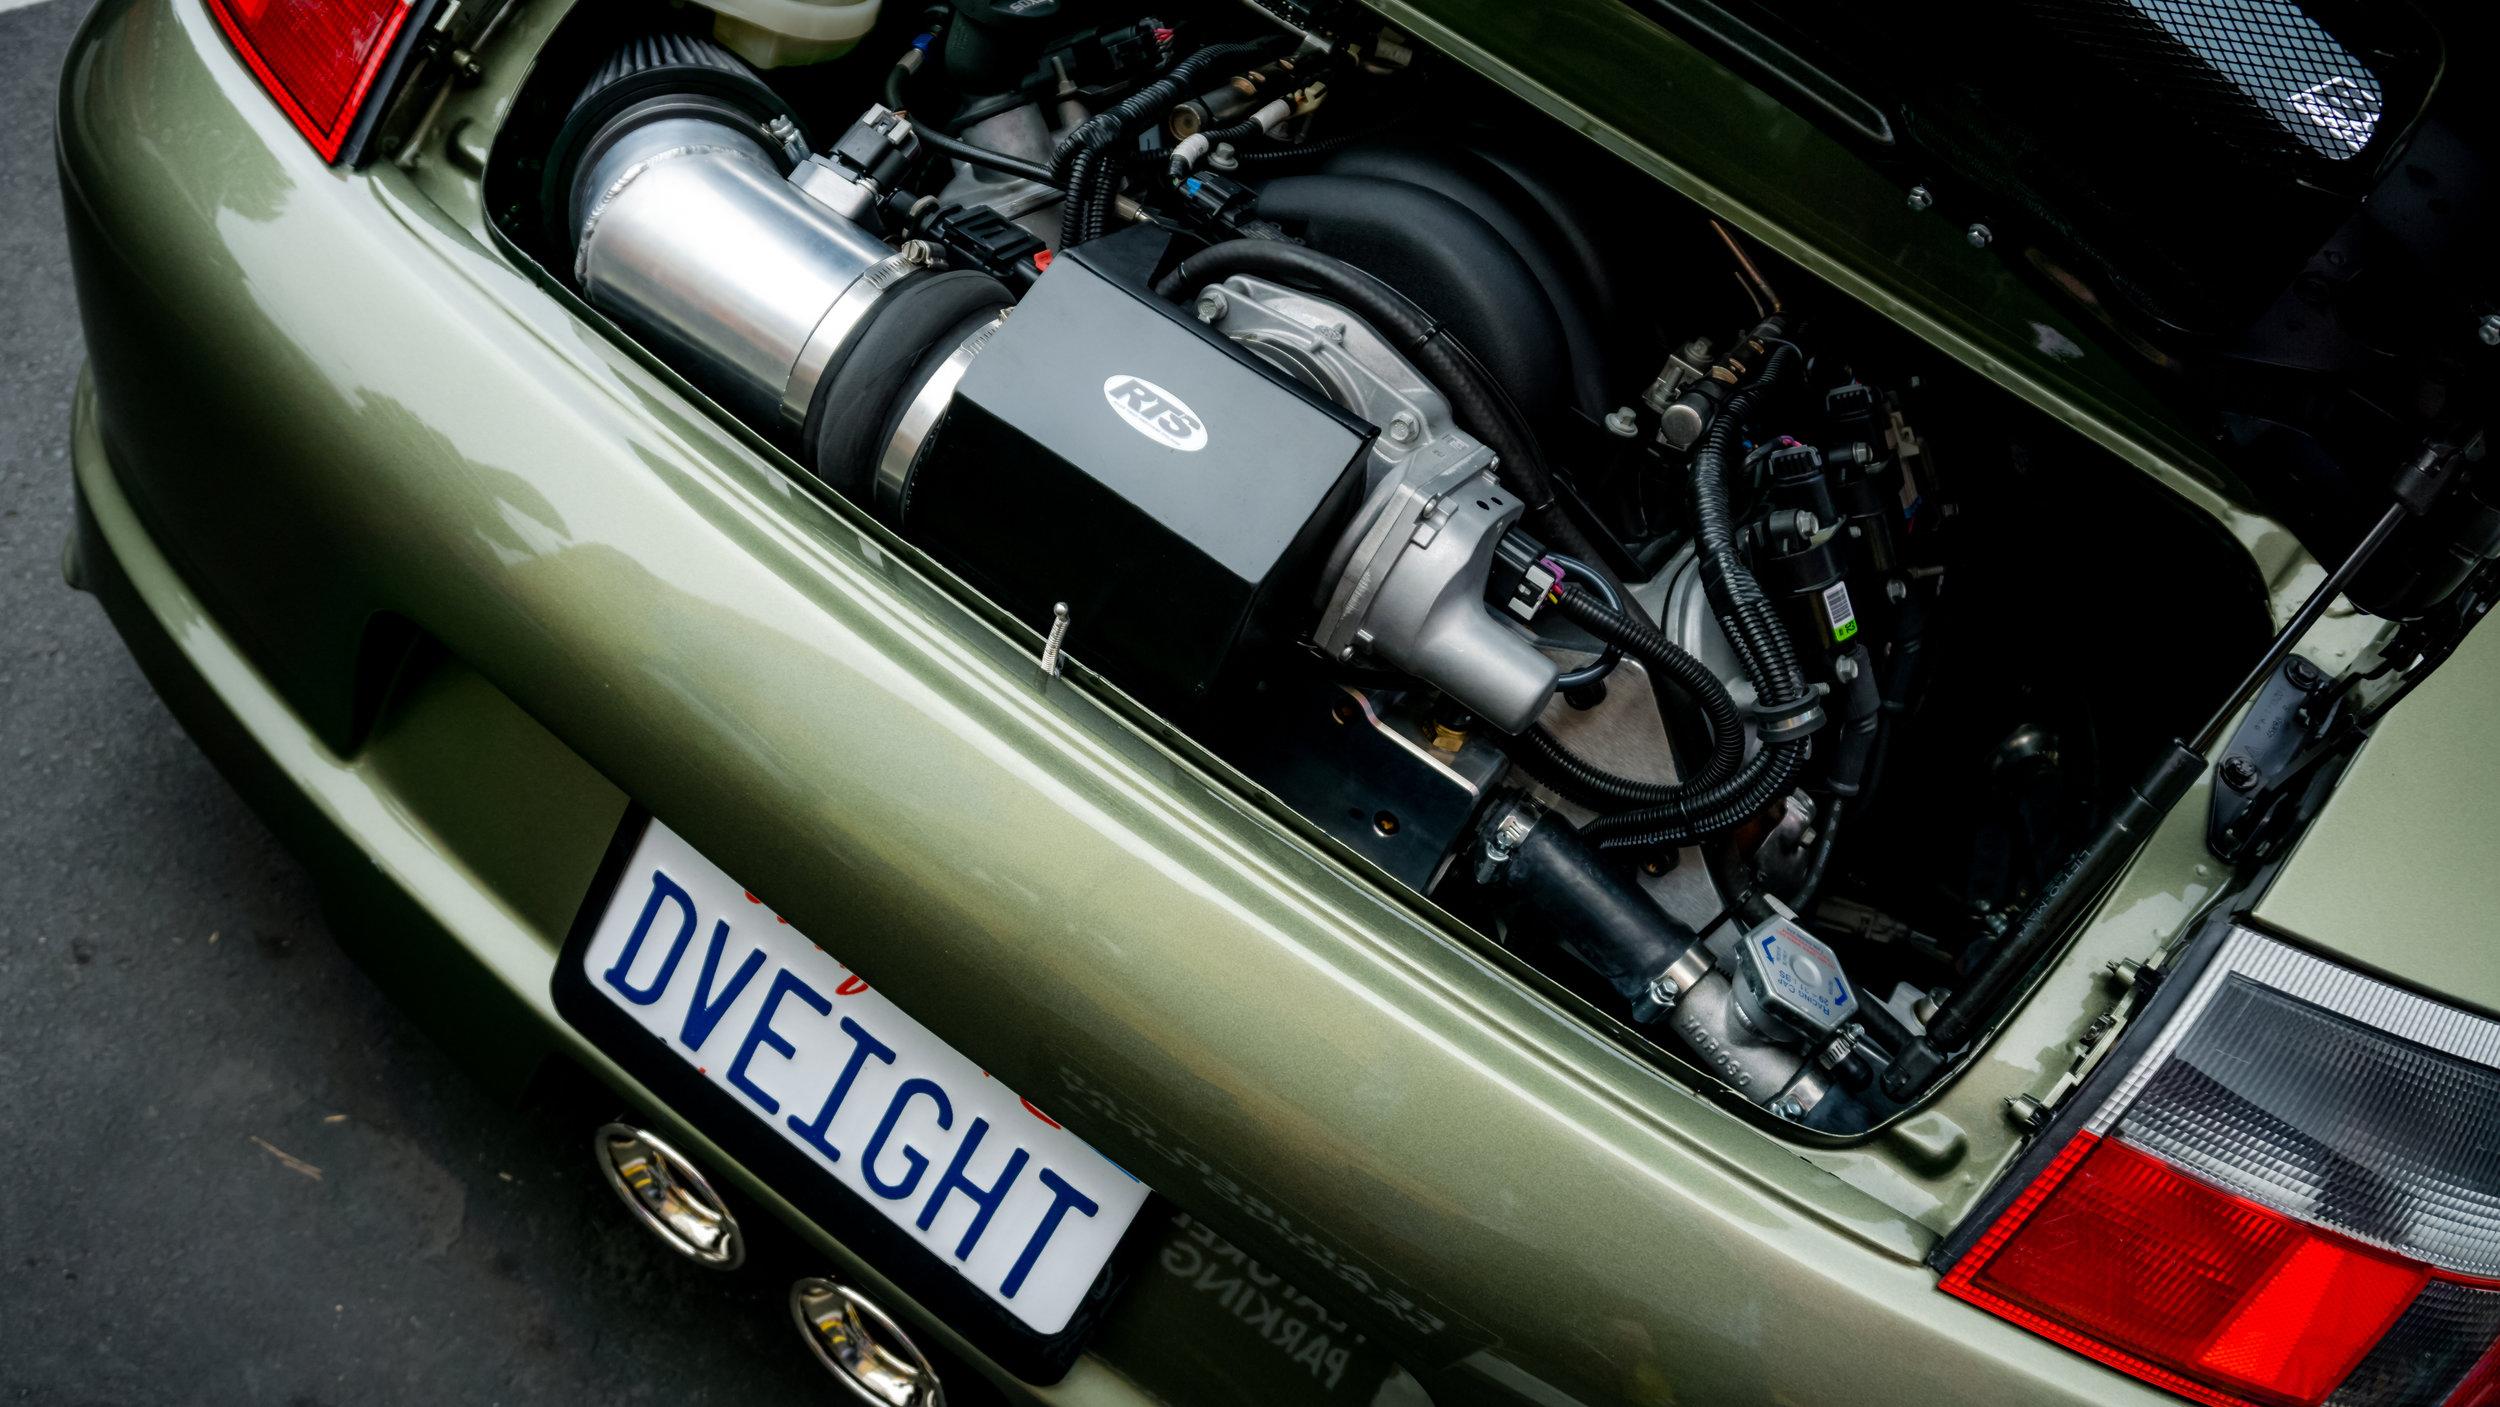 CNCPics_Porsche_911DV8_Engine.jpg